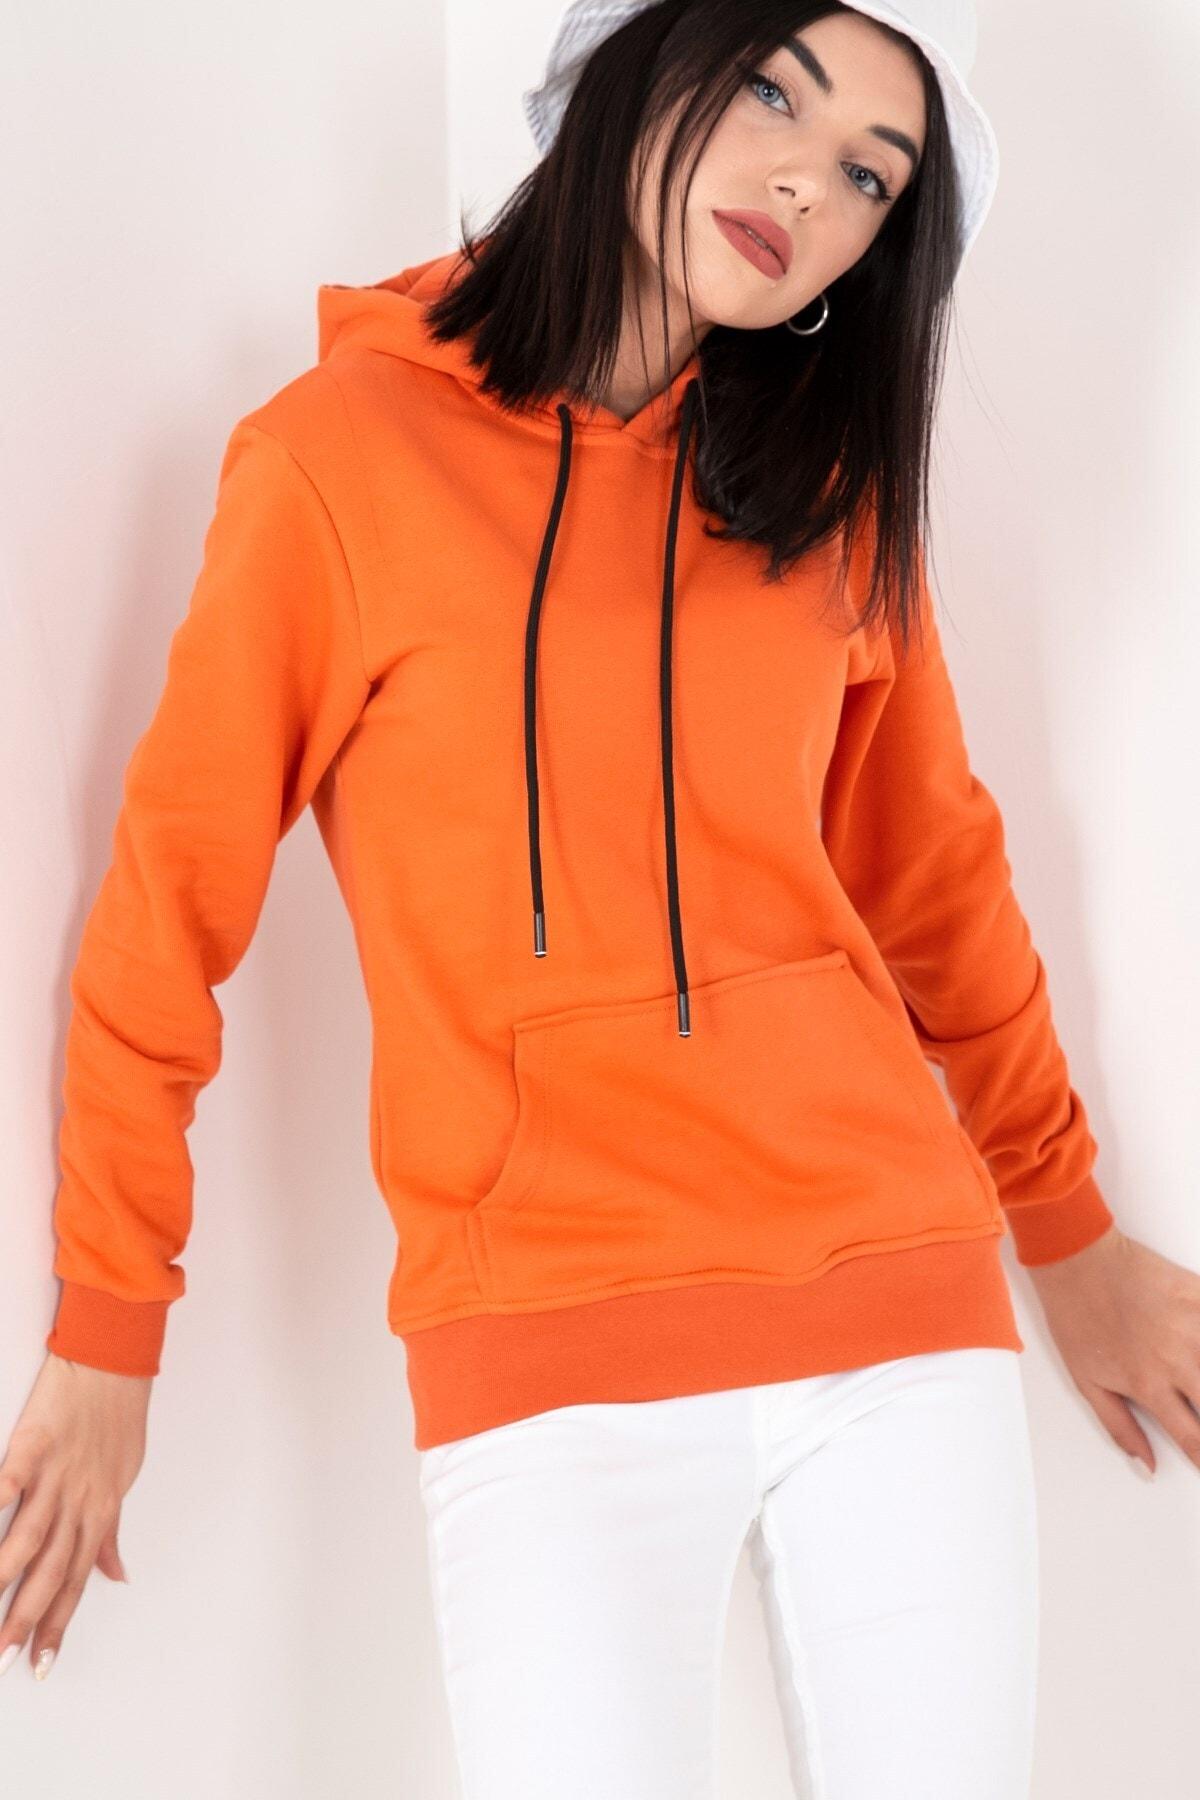 MY LIFE Mylife Kapüşonlu Kanguru Cep Kadın Sweatshirt Turuncu - Mlf2735 1